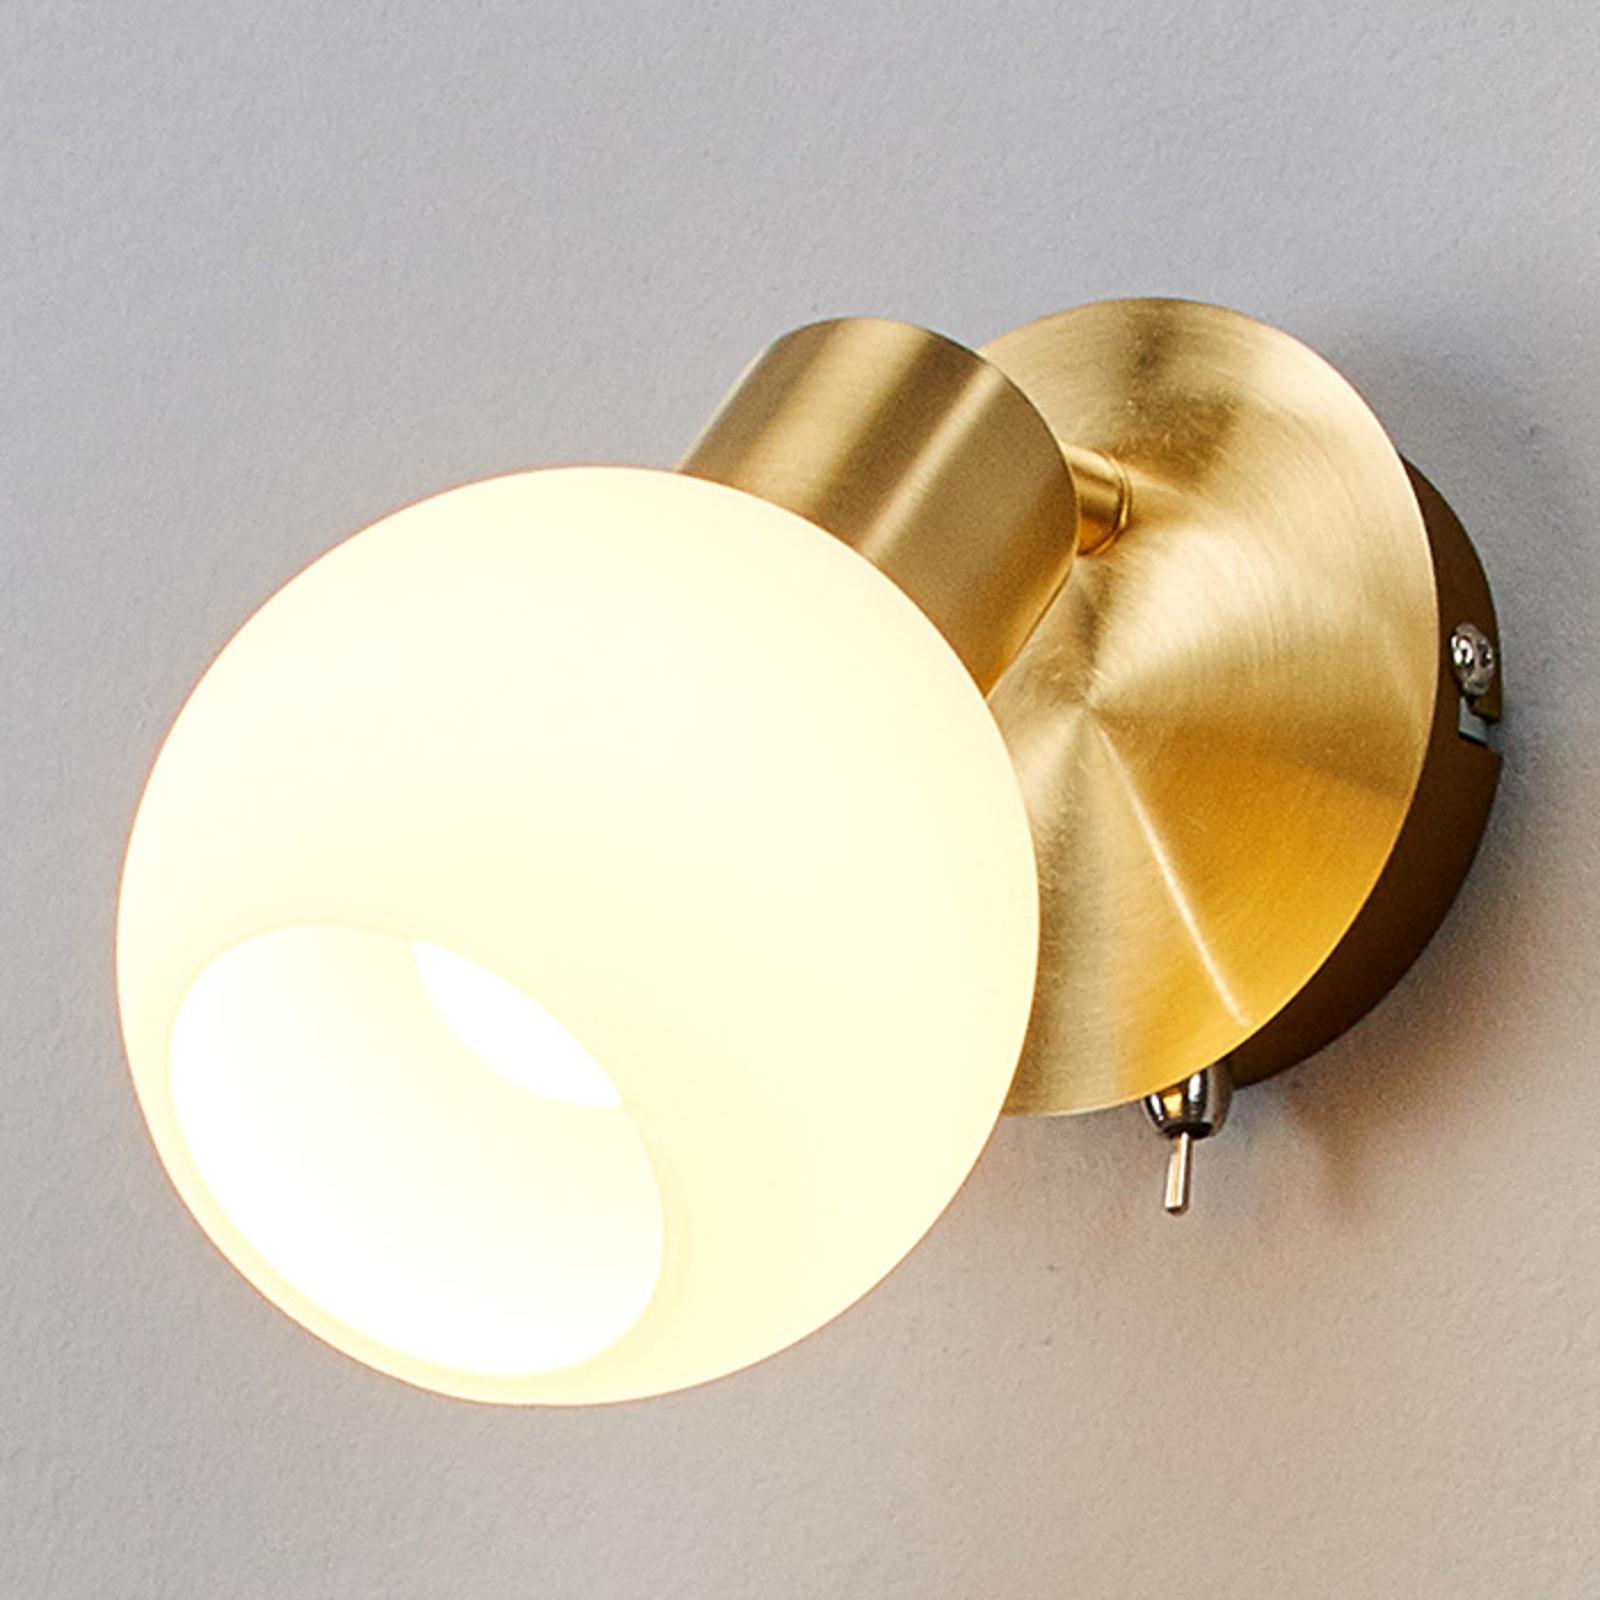 Jednopunktowa lampa ścienna LED ELAINA, mosiężna